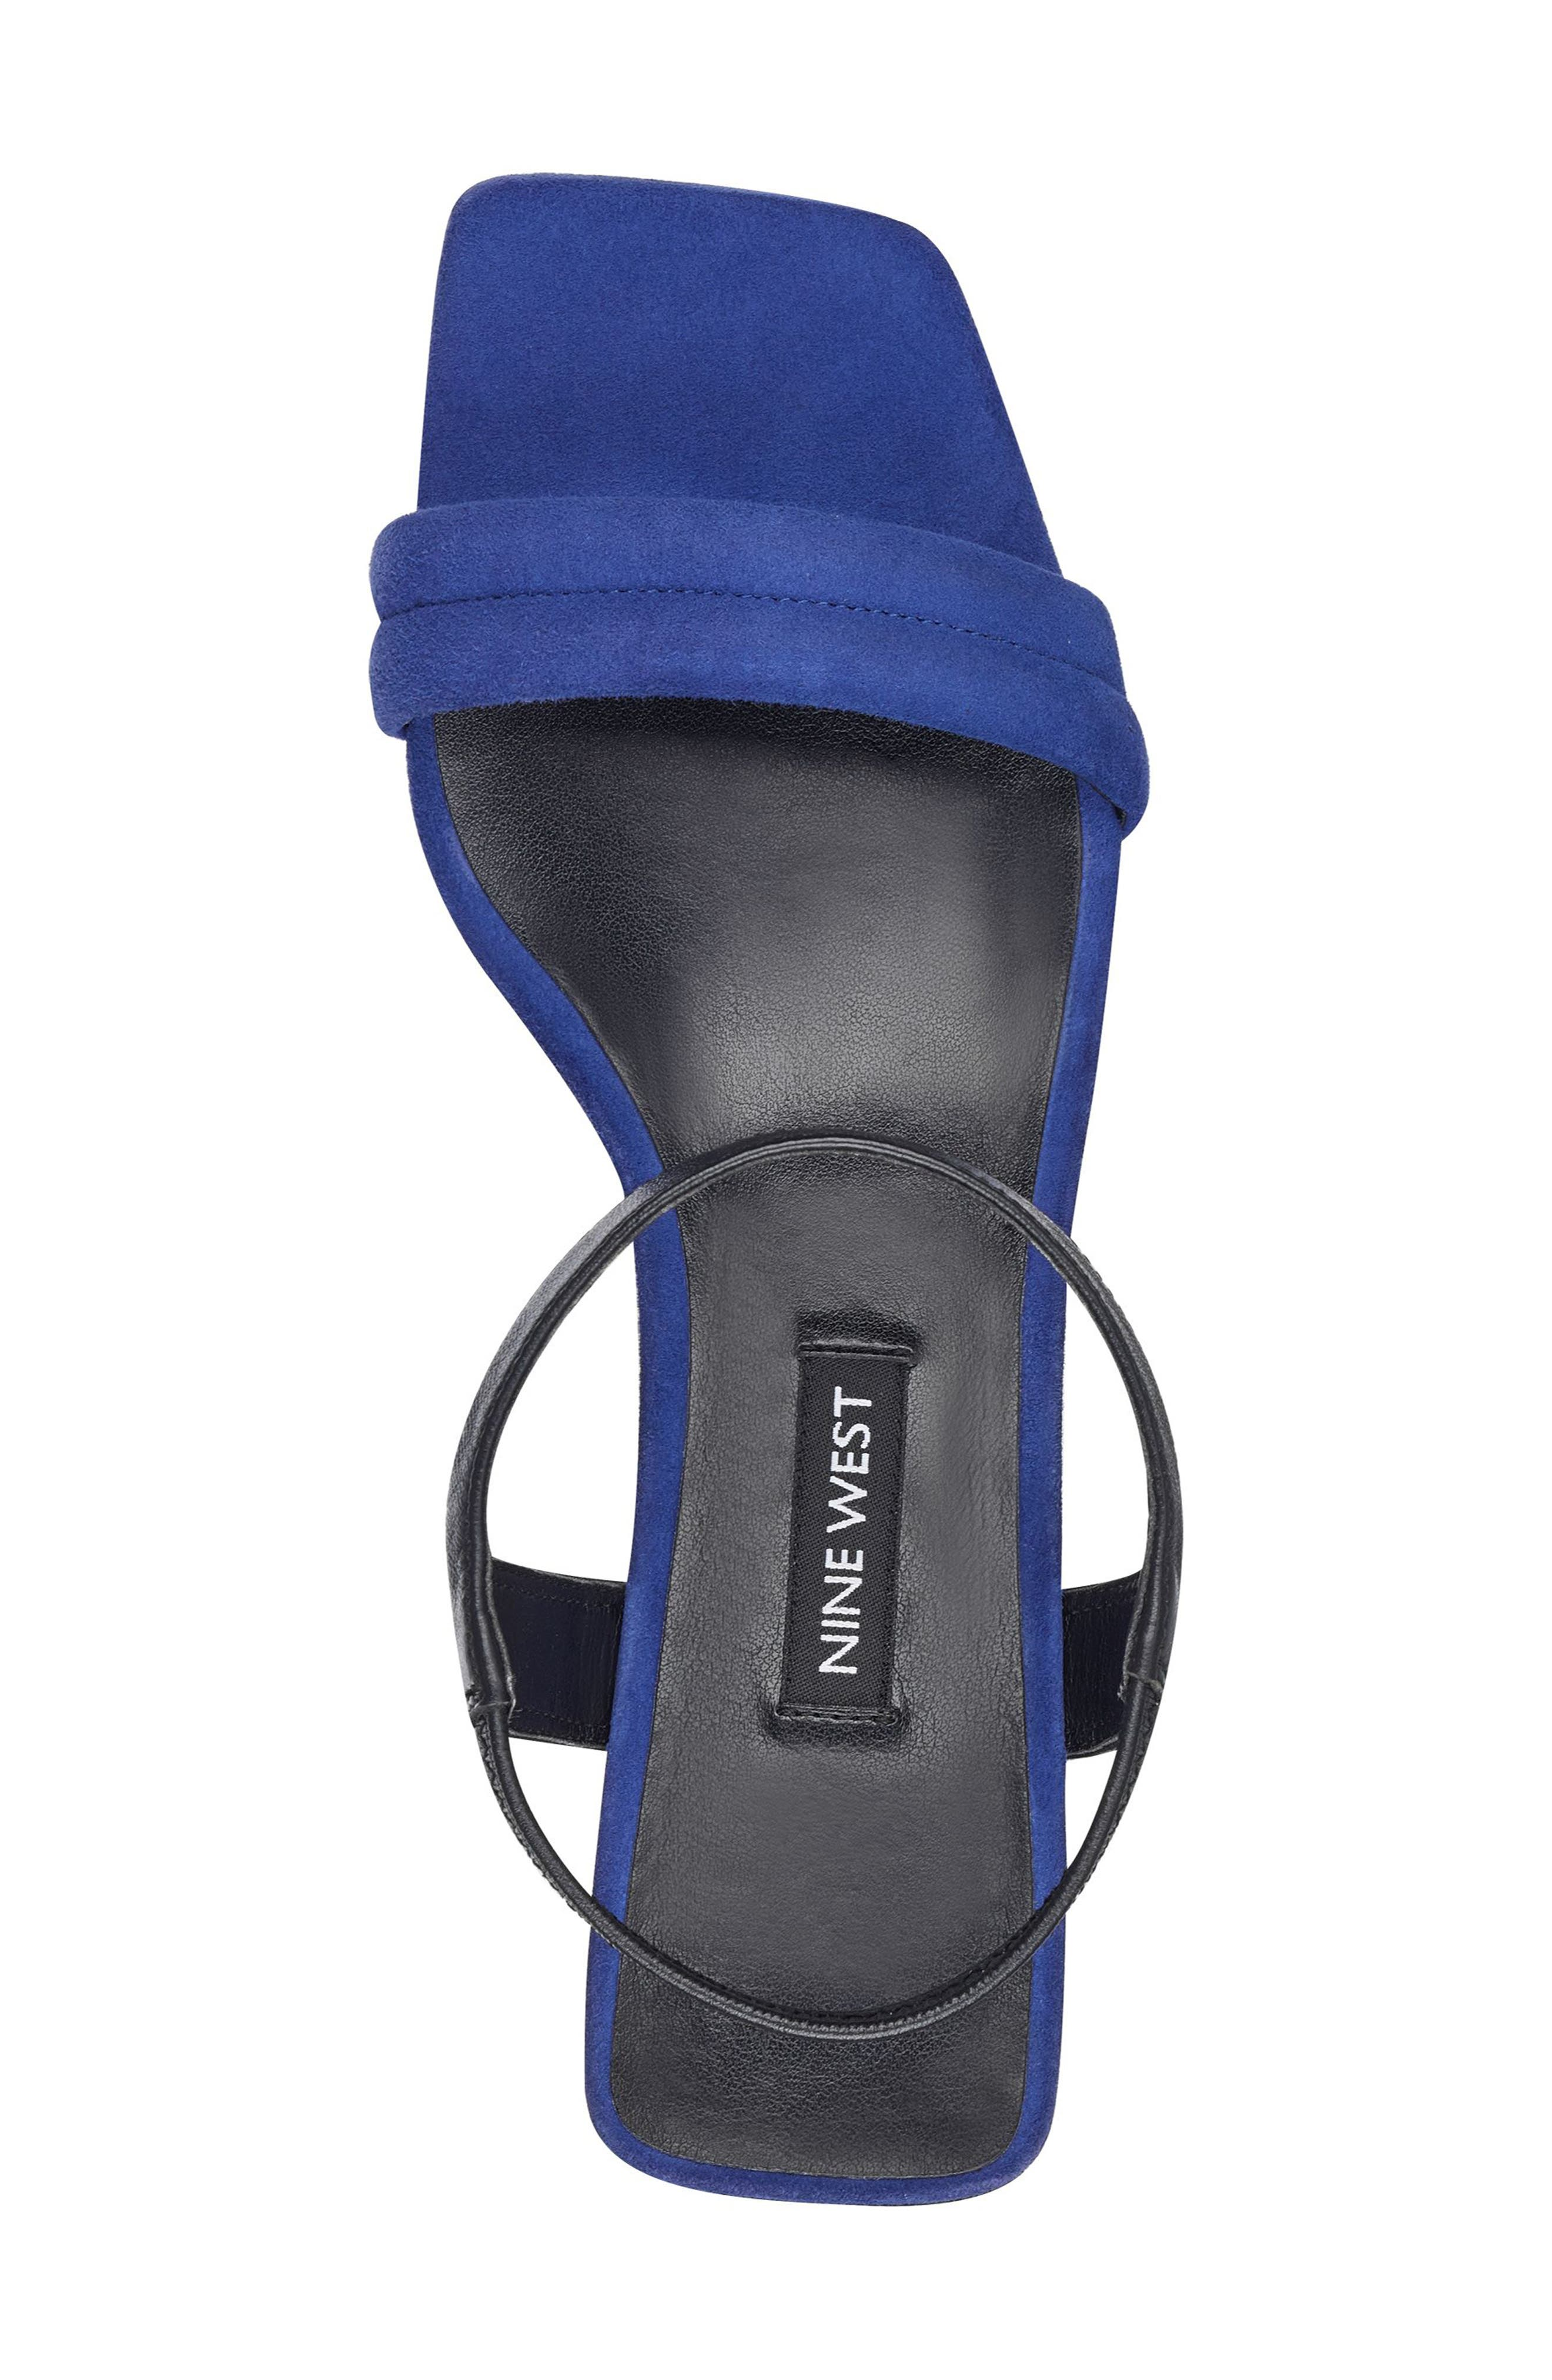 Urgreat Ankle Strap Sandal,                             Alternate thumbnail 4, color,                             Dark Blue/ Black Suede